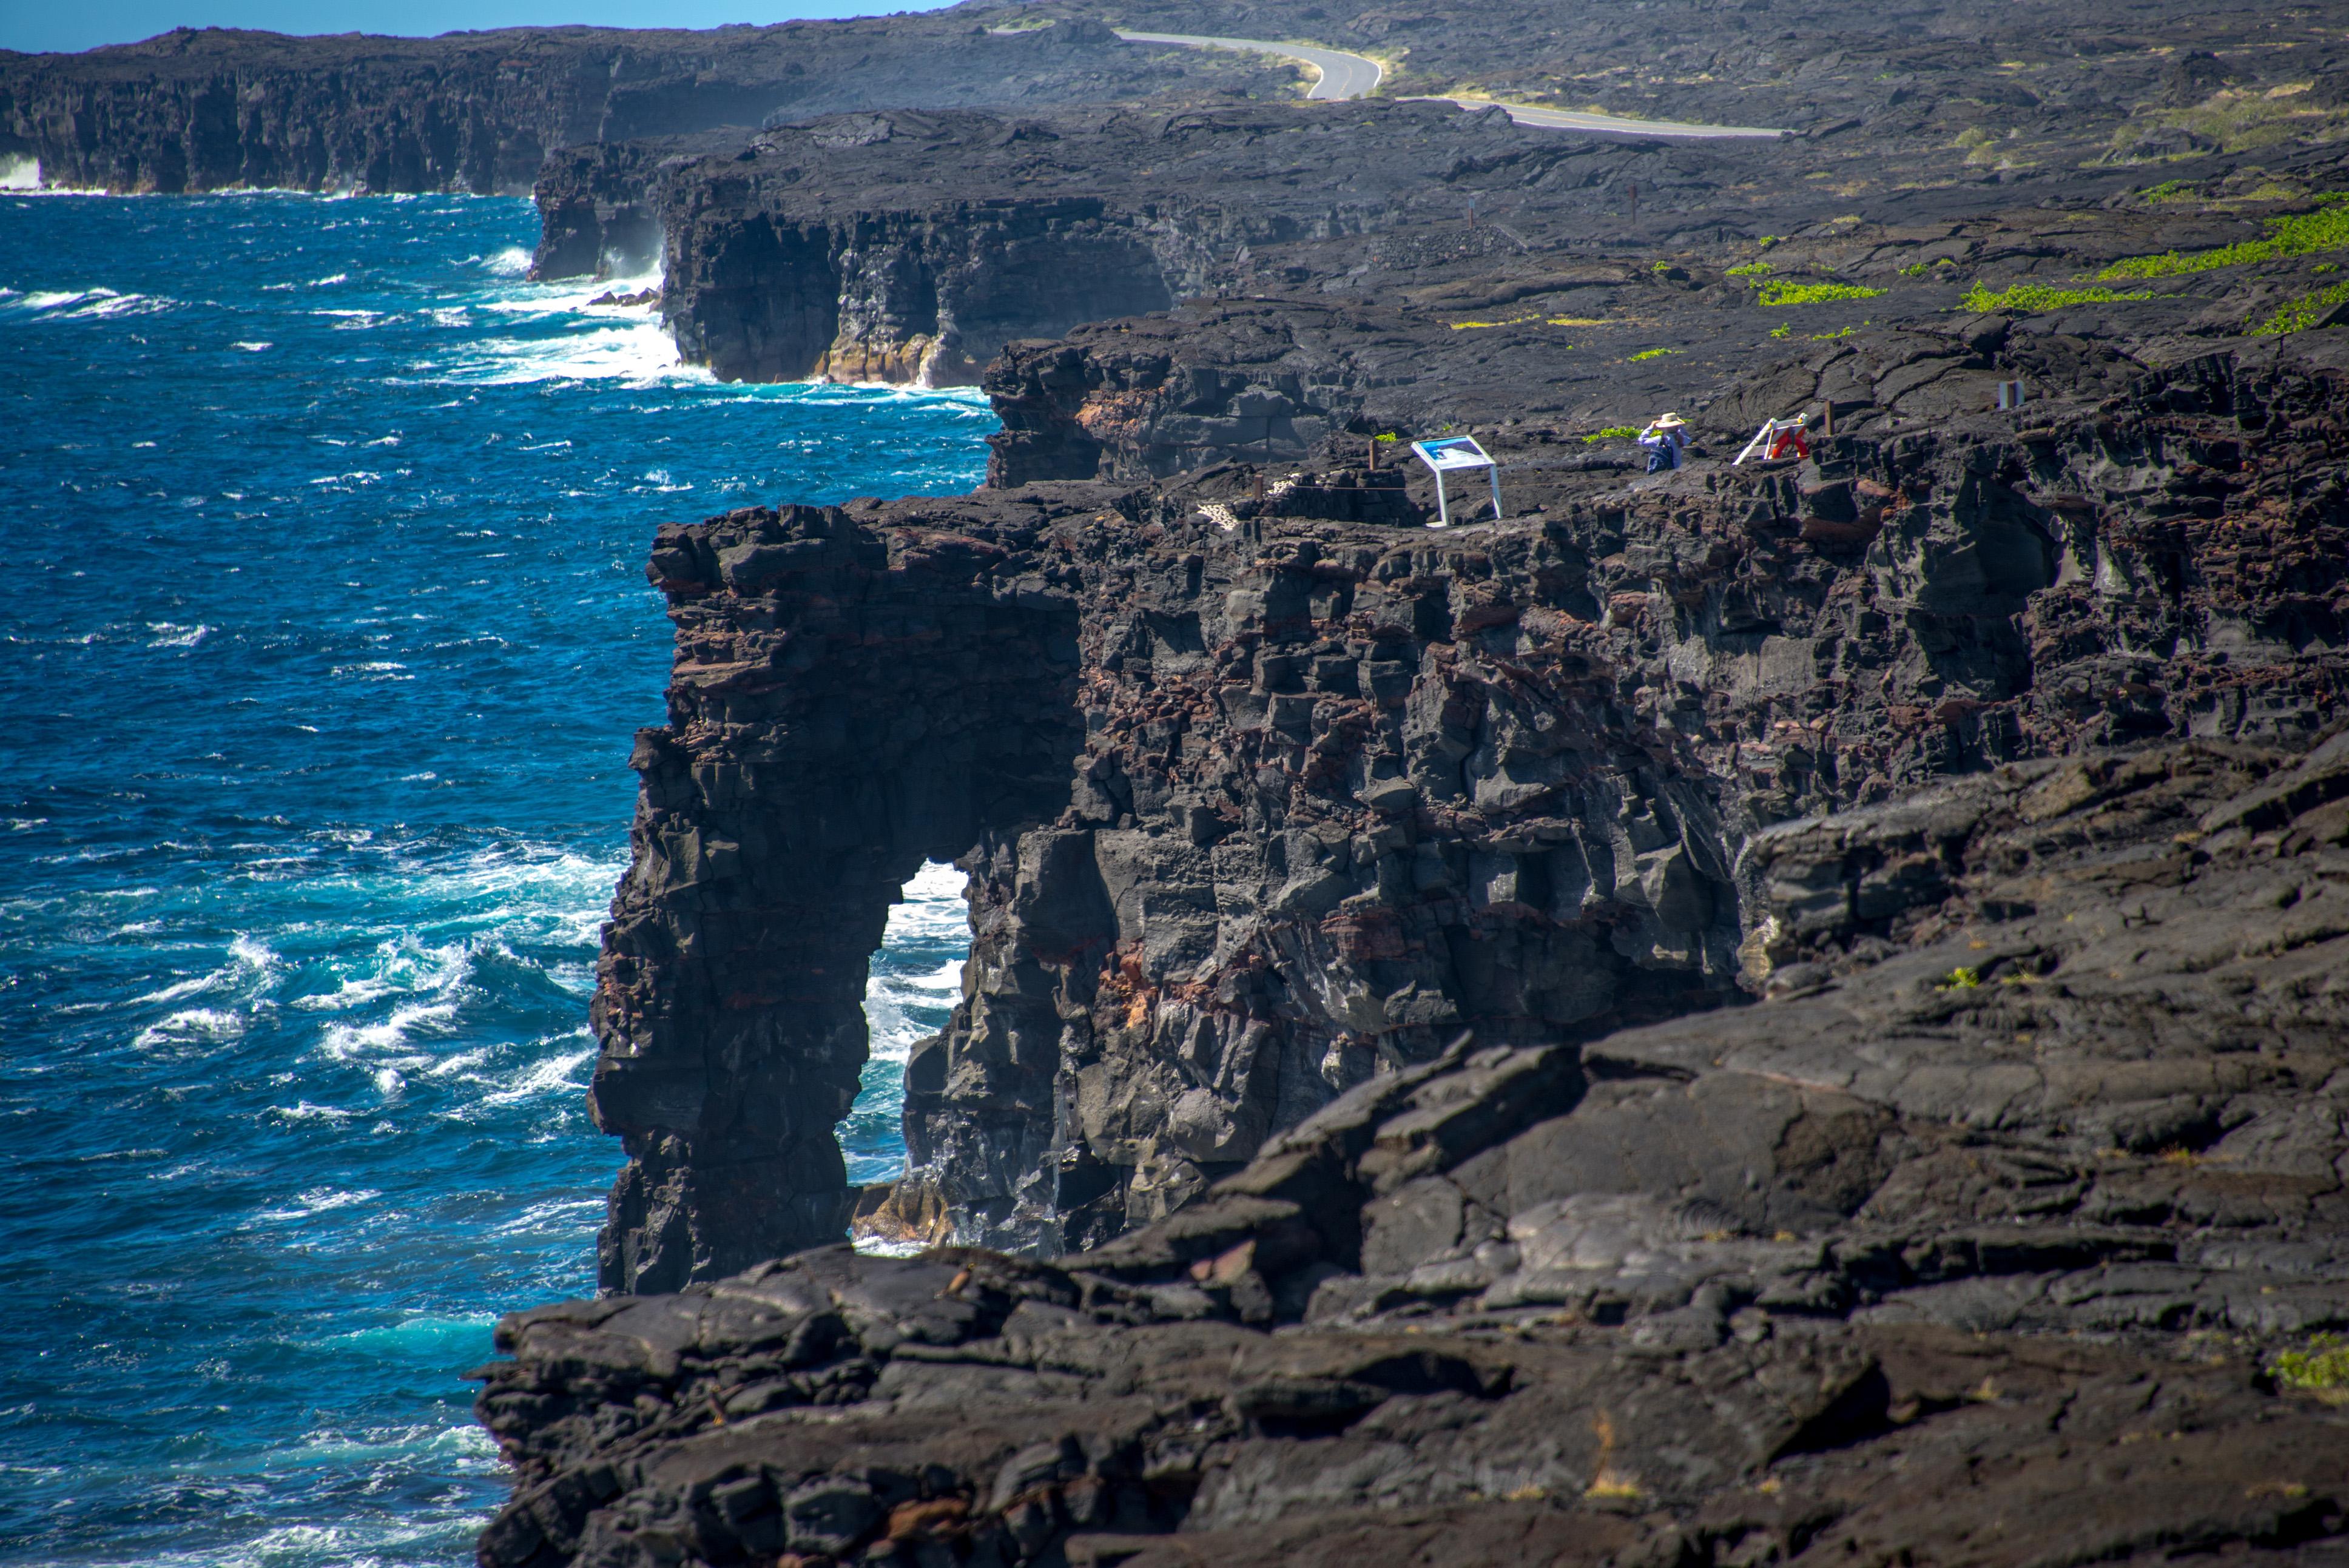 S Sea Island Trail